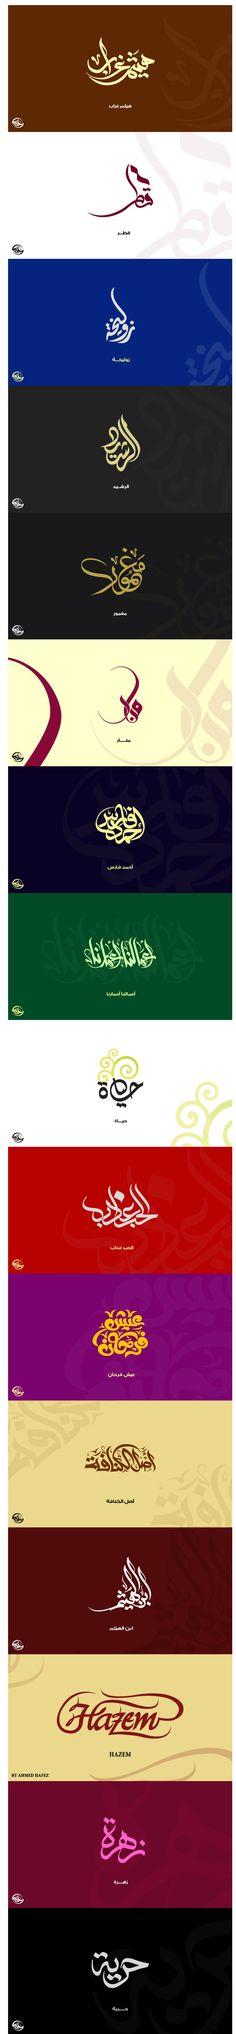 islamic-Arabic-Calligraphy-logo-design-example-8